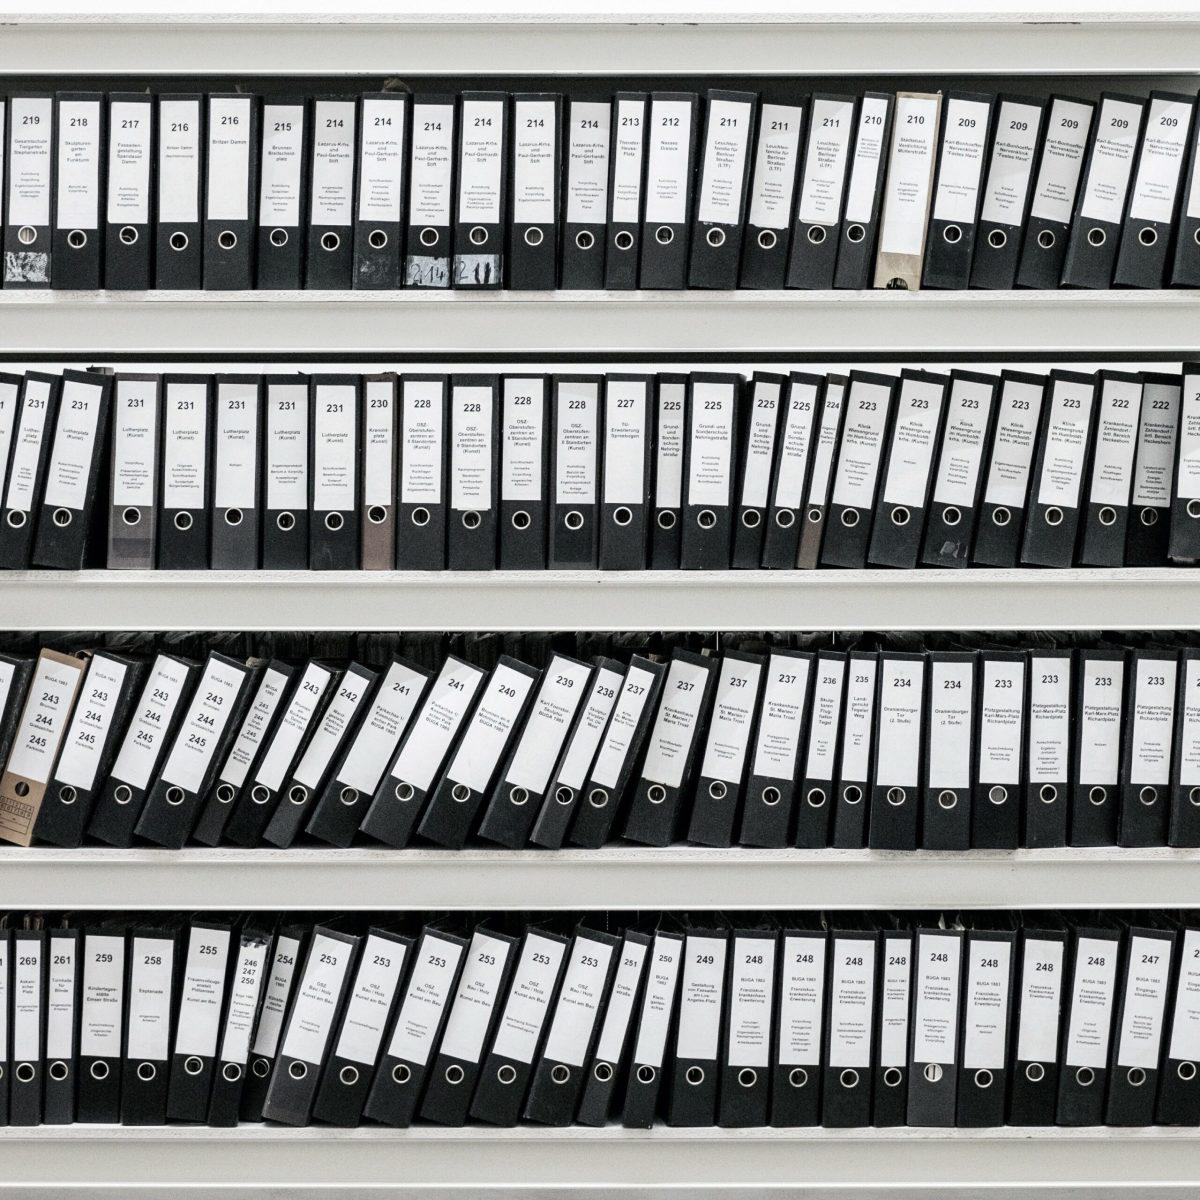 Shelves full of number binders